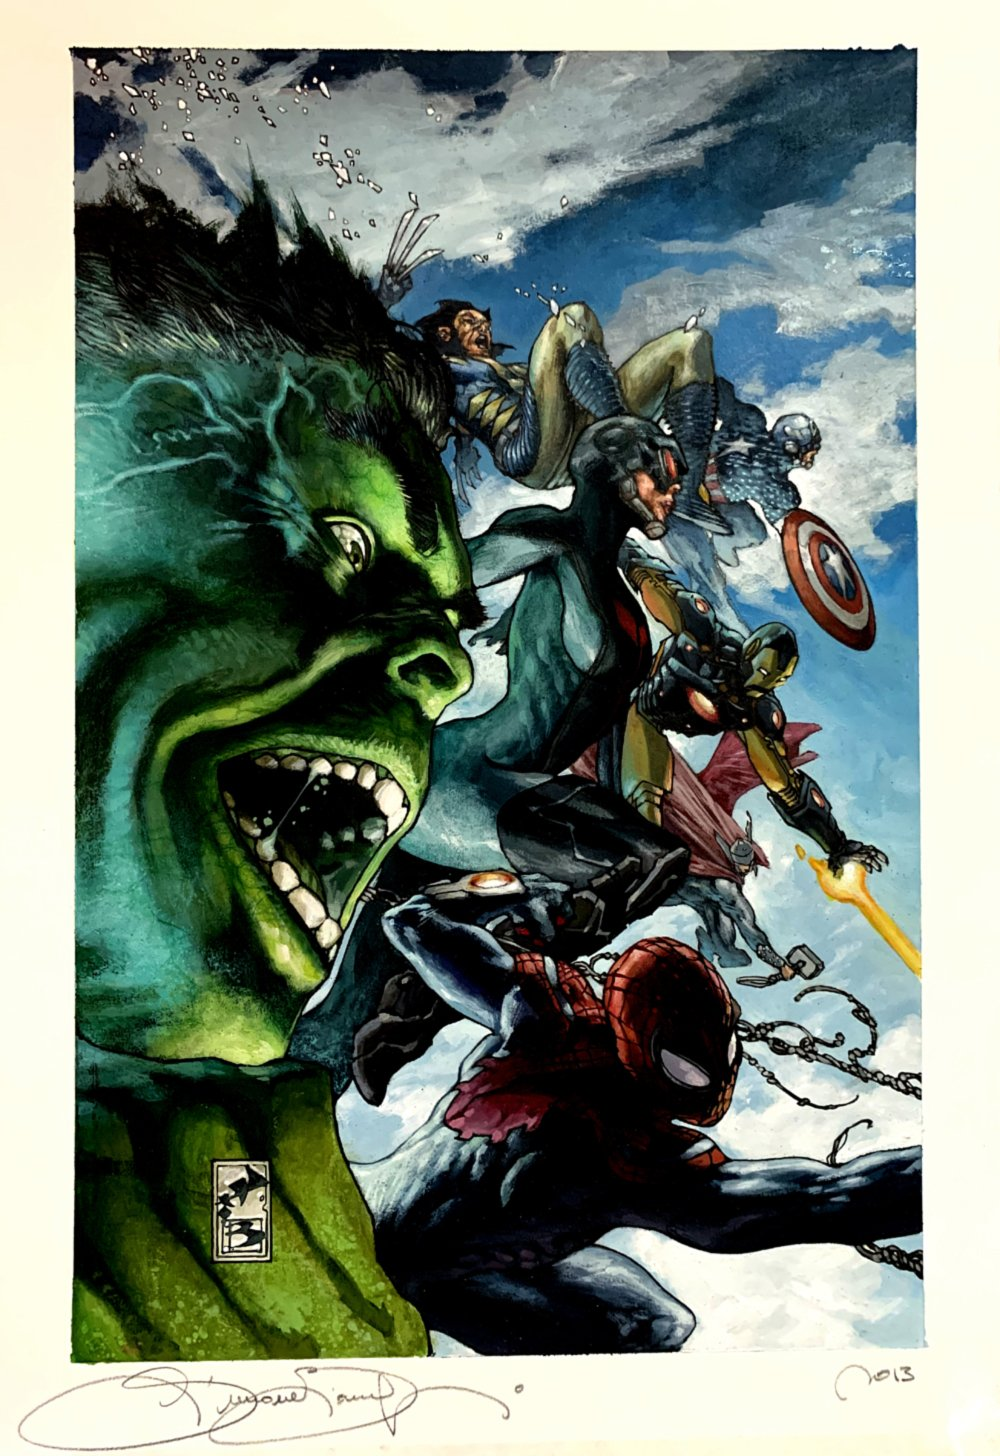 Avengers World #2 Over-Sized Painted Cover (Hulk, Spider-Man, Wolverine, Captain America, Iron Man, Thor, Smasher!) 2013